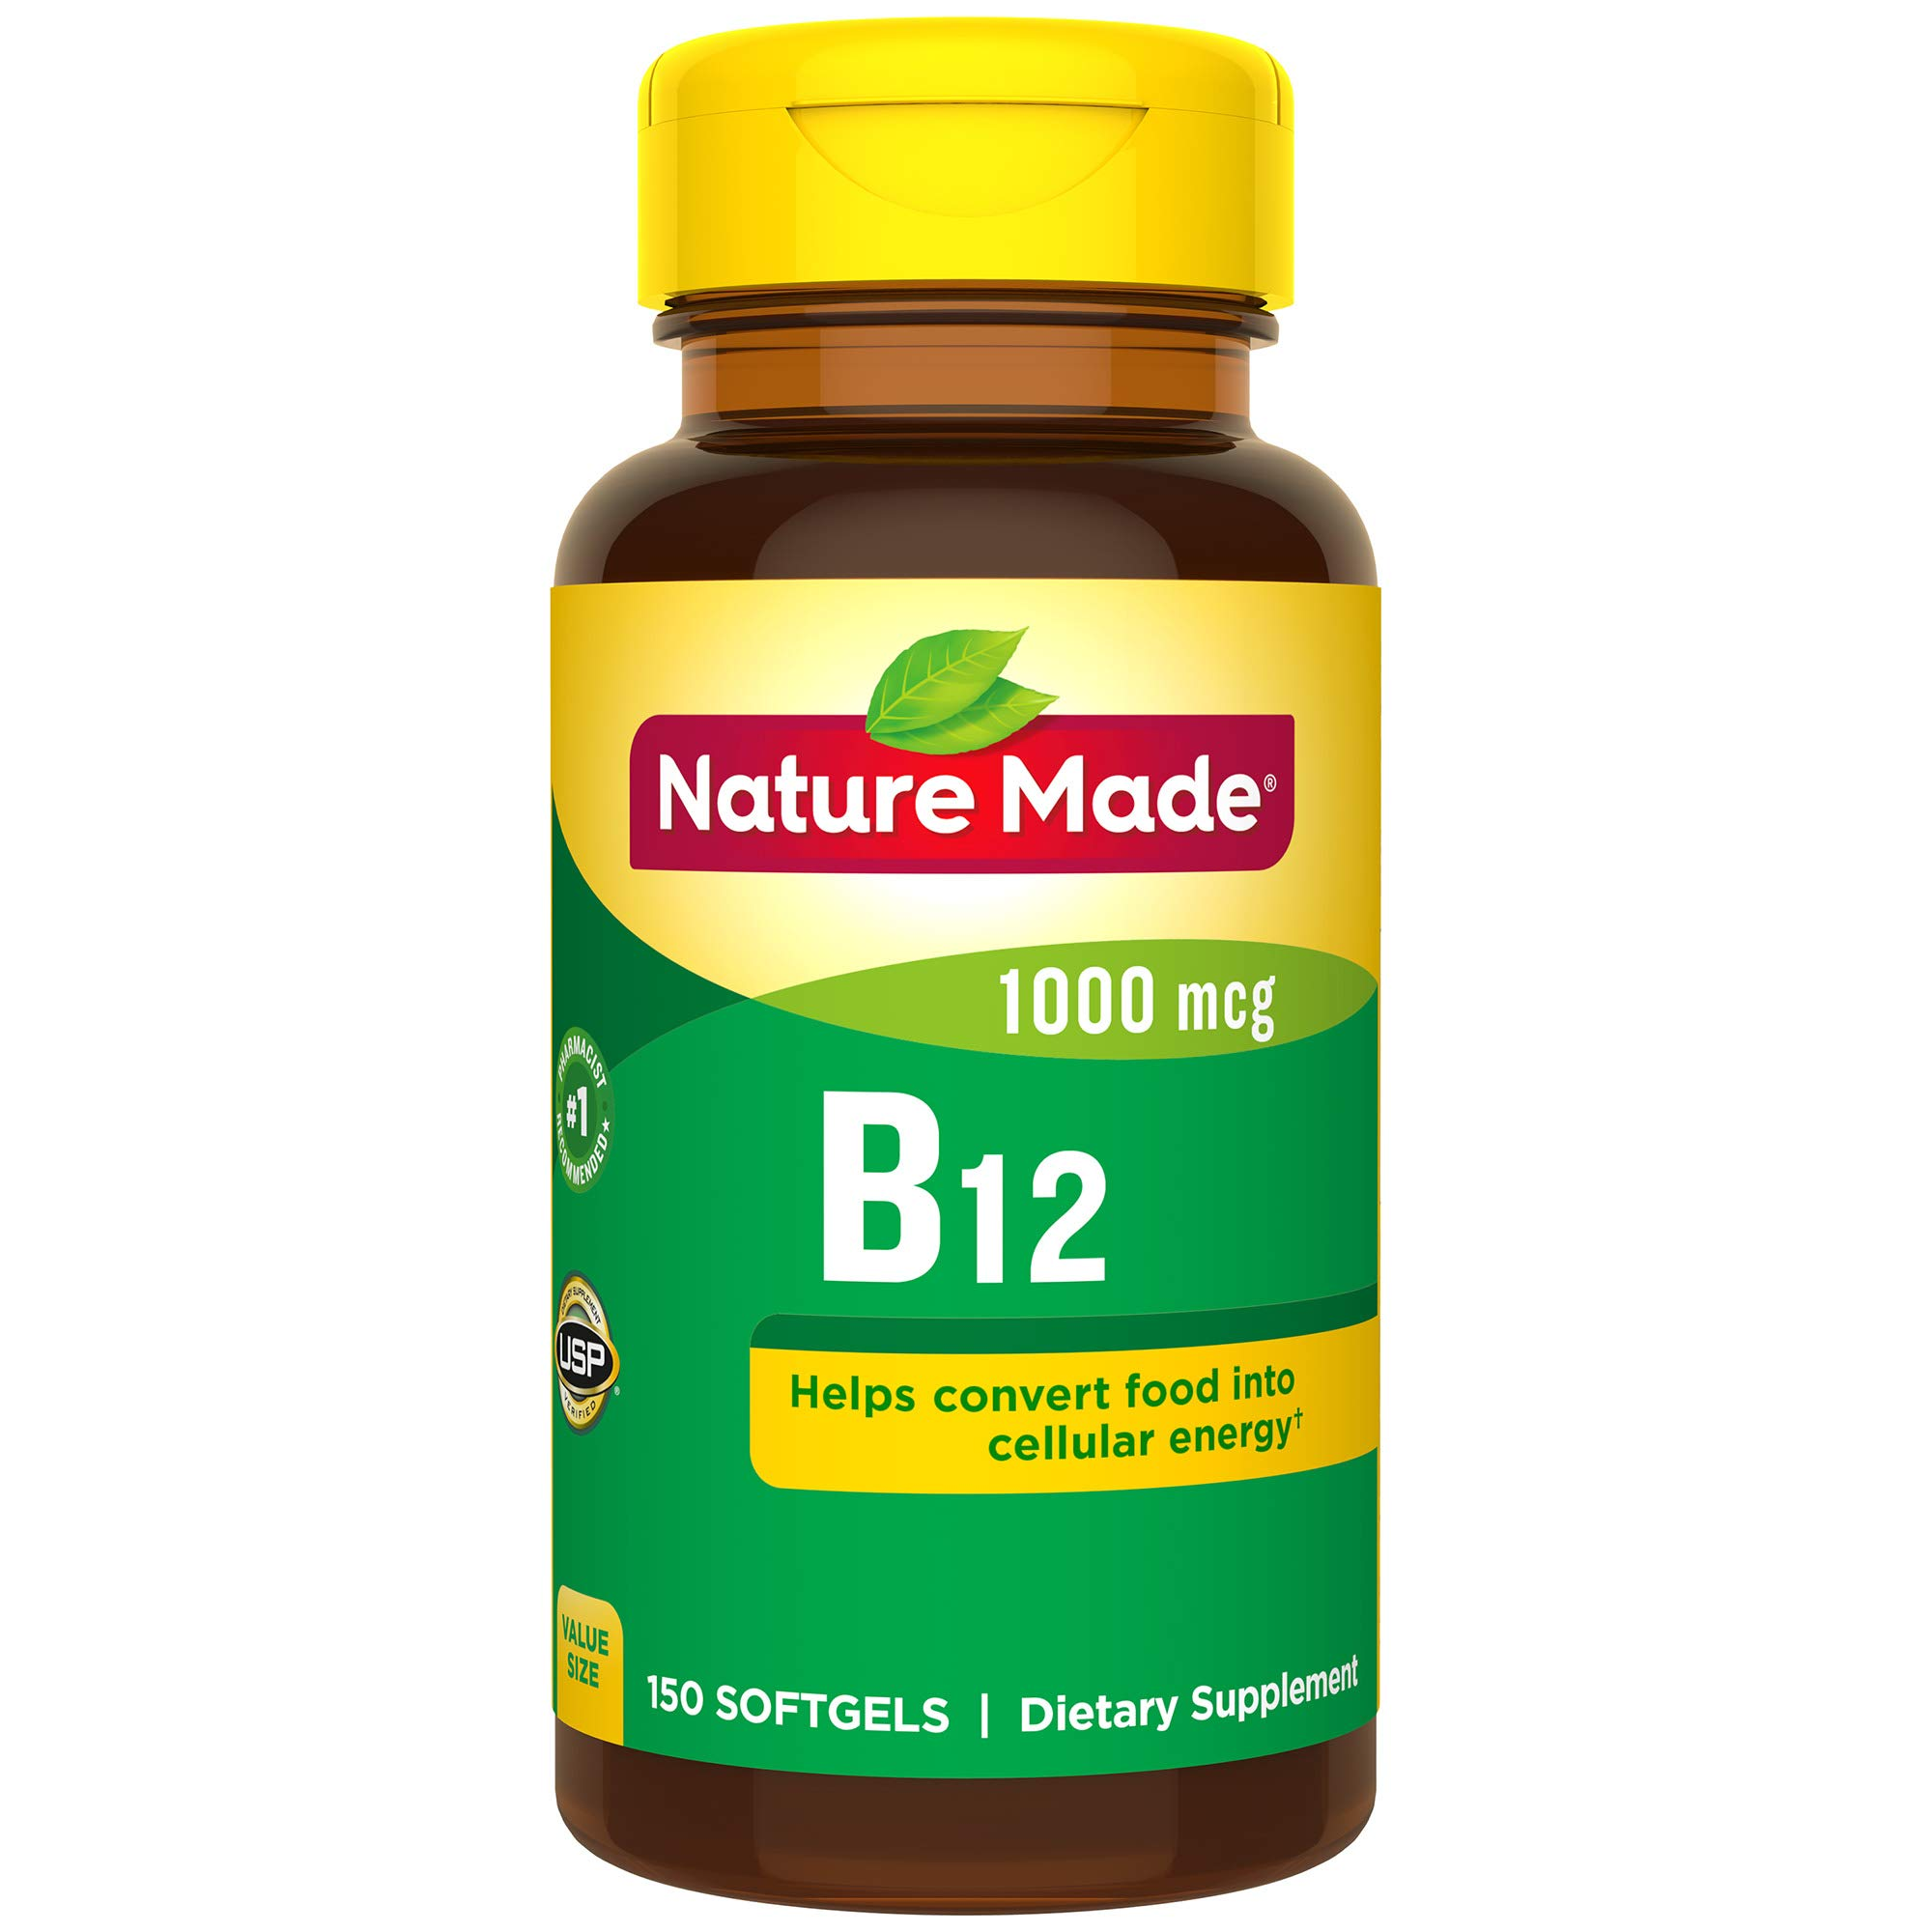 Nature Made Vitamin B12 1000 mcg. Softgels Value Size 150 Ct